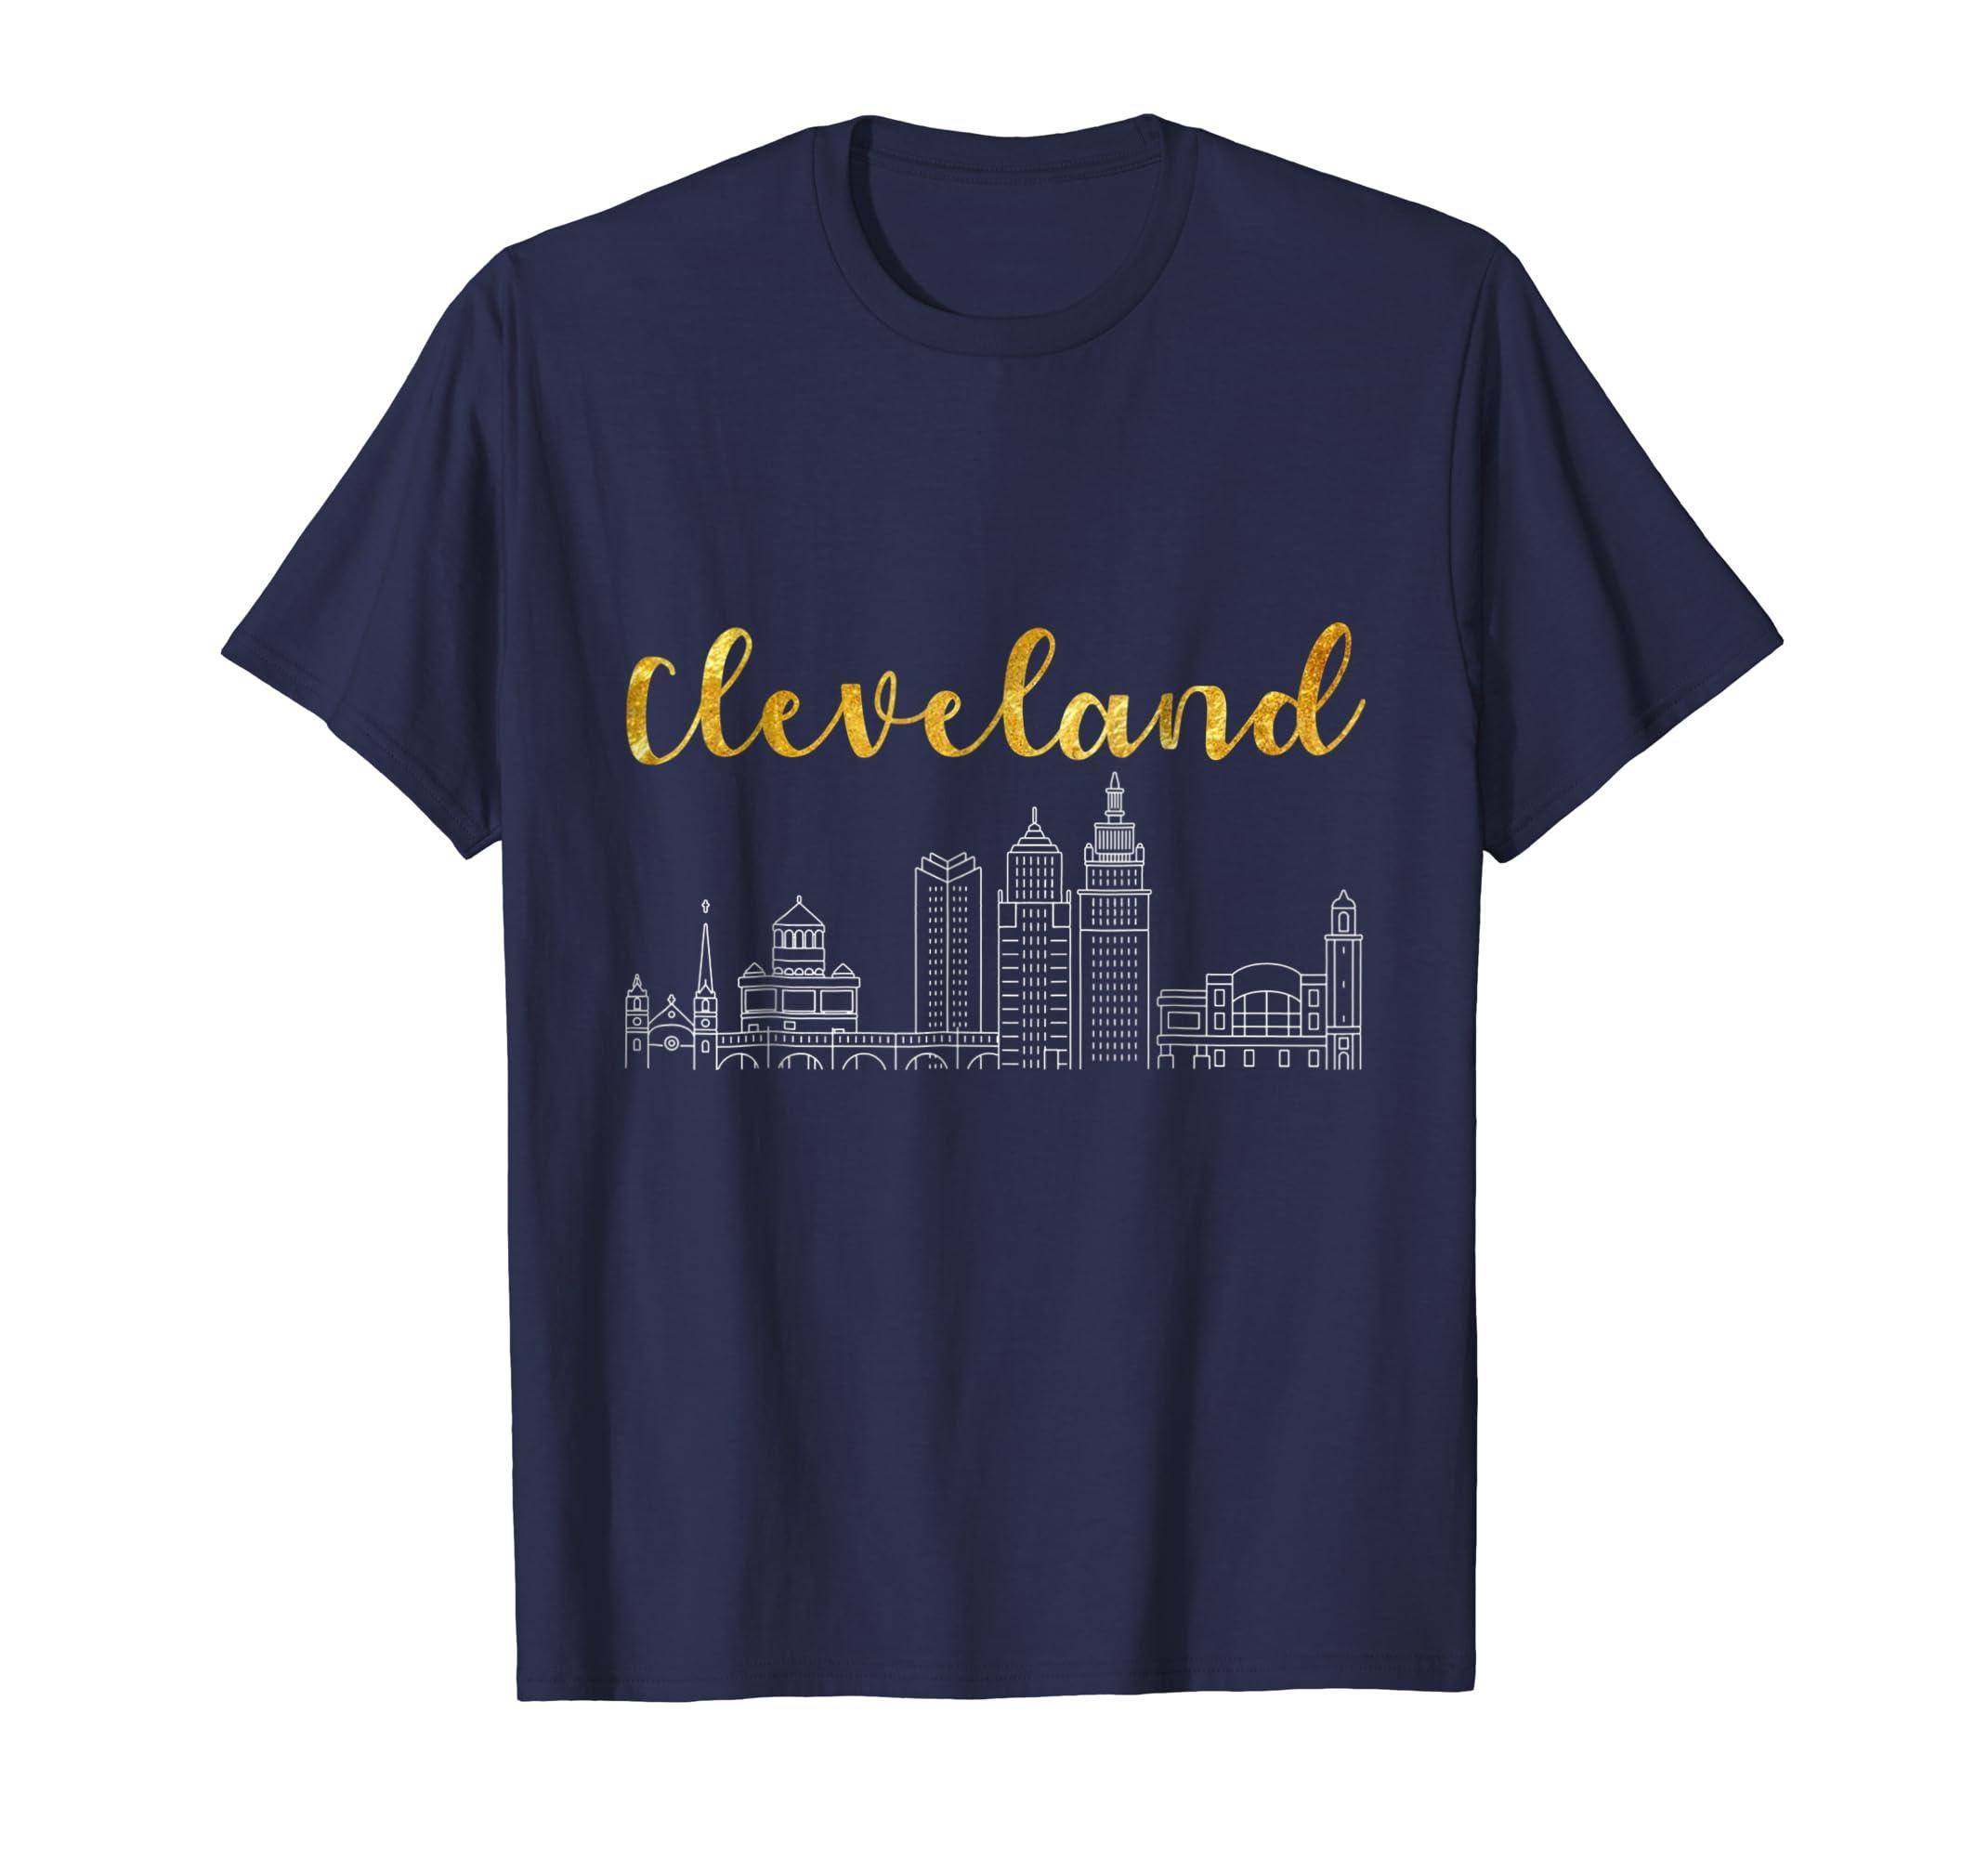 Classic Cleveland City Skyline T-Shirt Souvenir Gifts-SFL